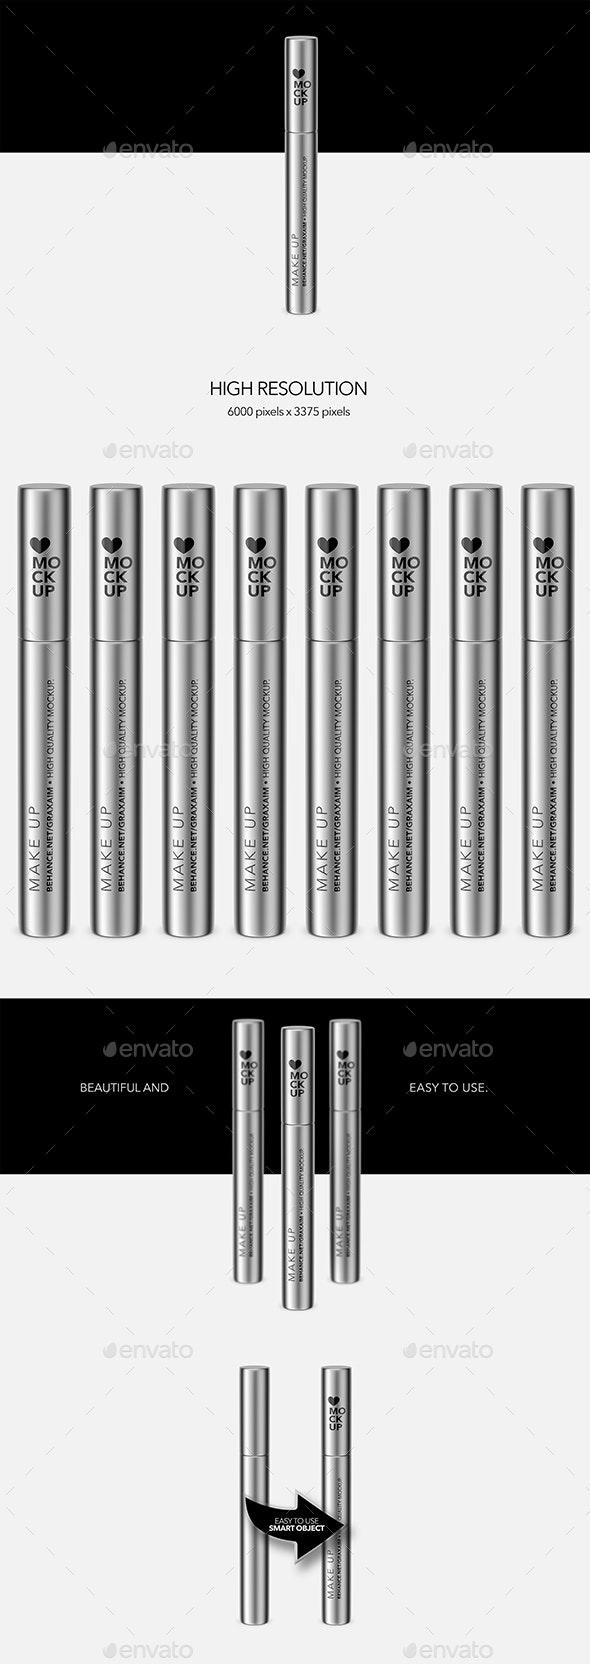 Cosmetics Mockup - Lipstick / Mascara / Eyeliner - Metallic - Beauty Packaging